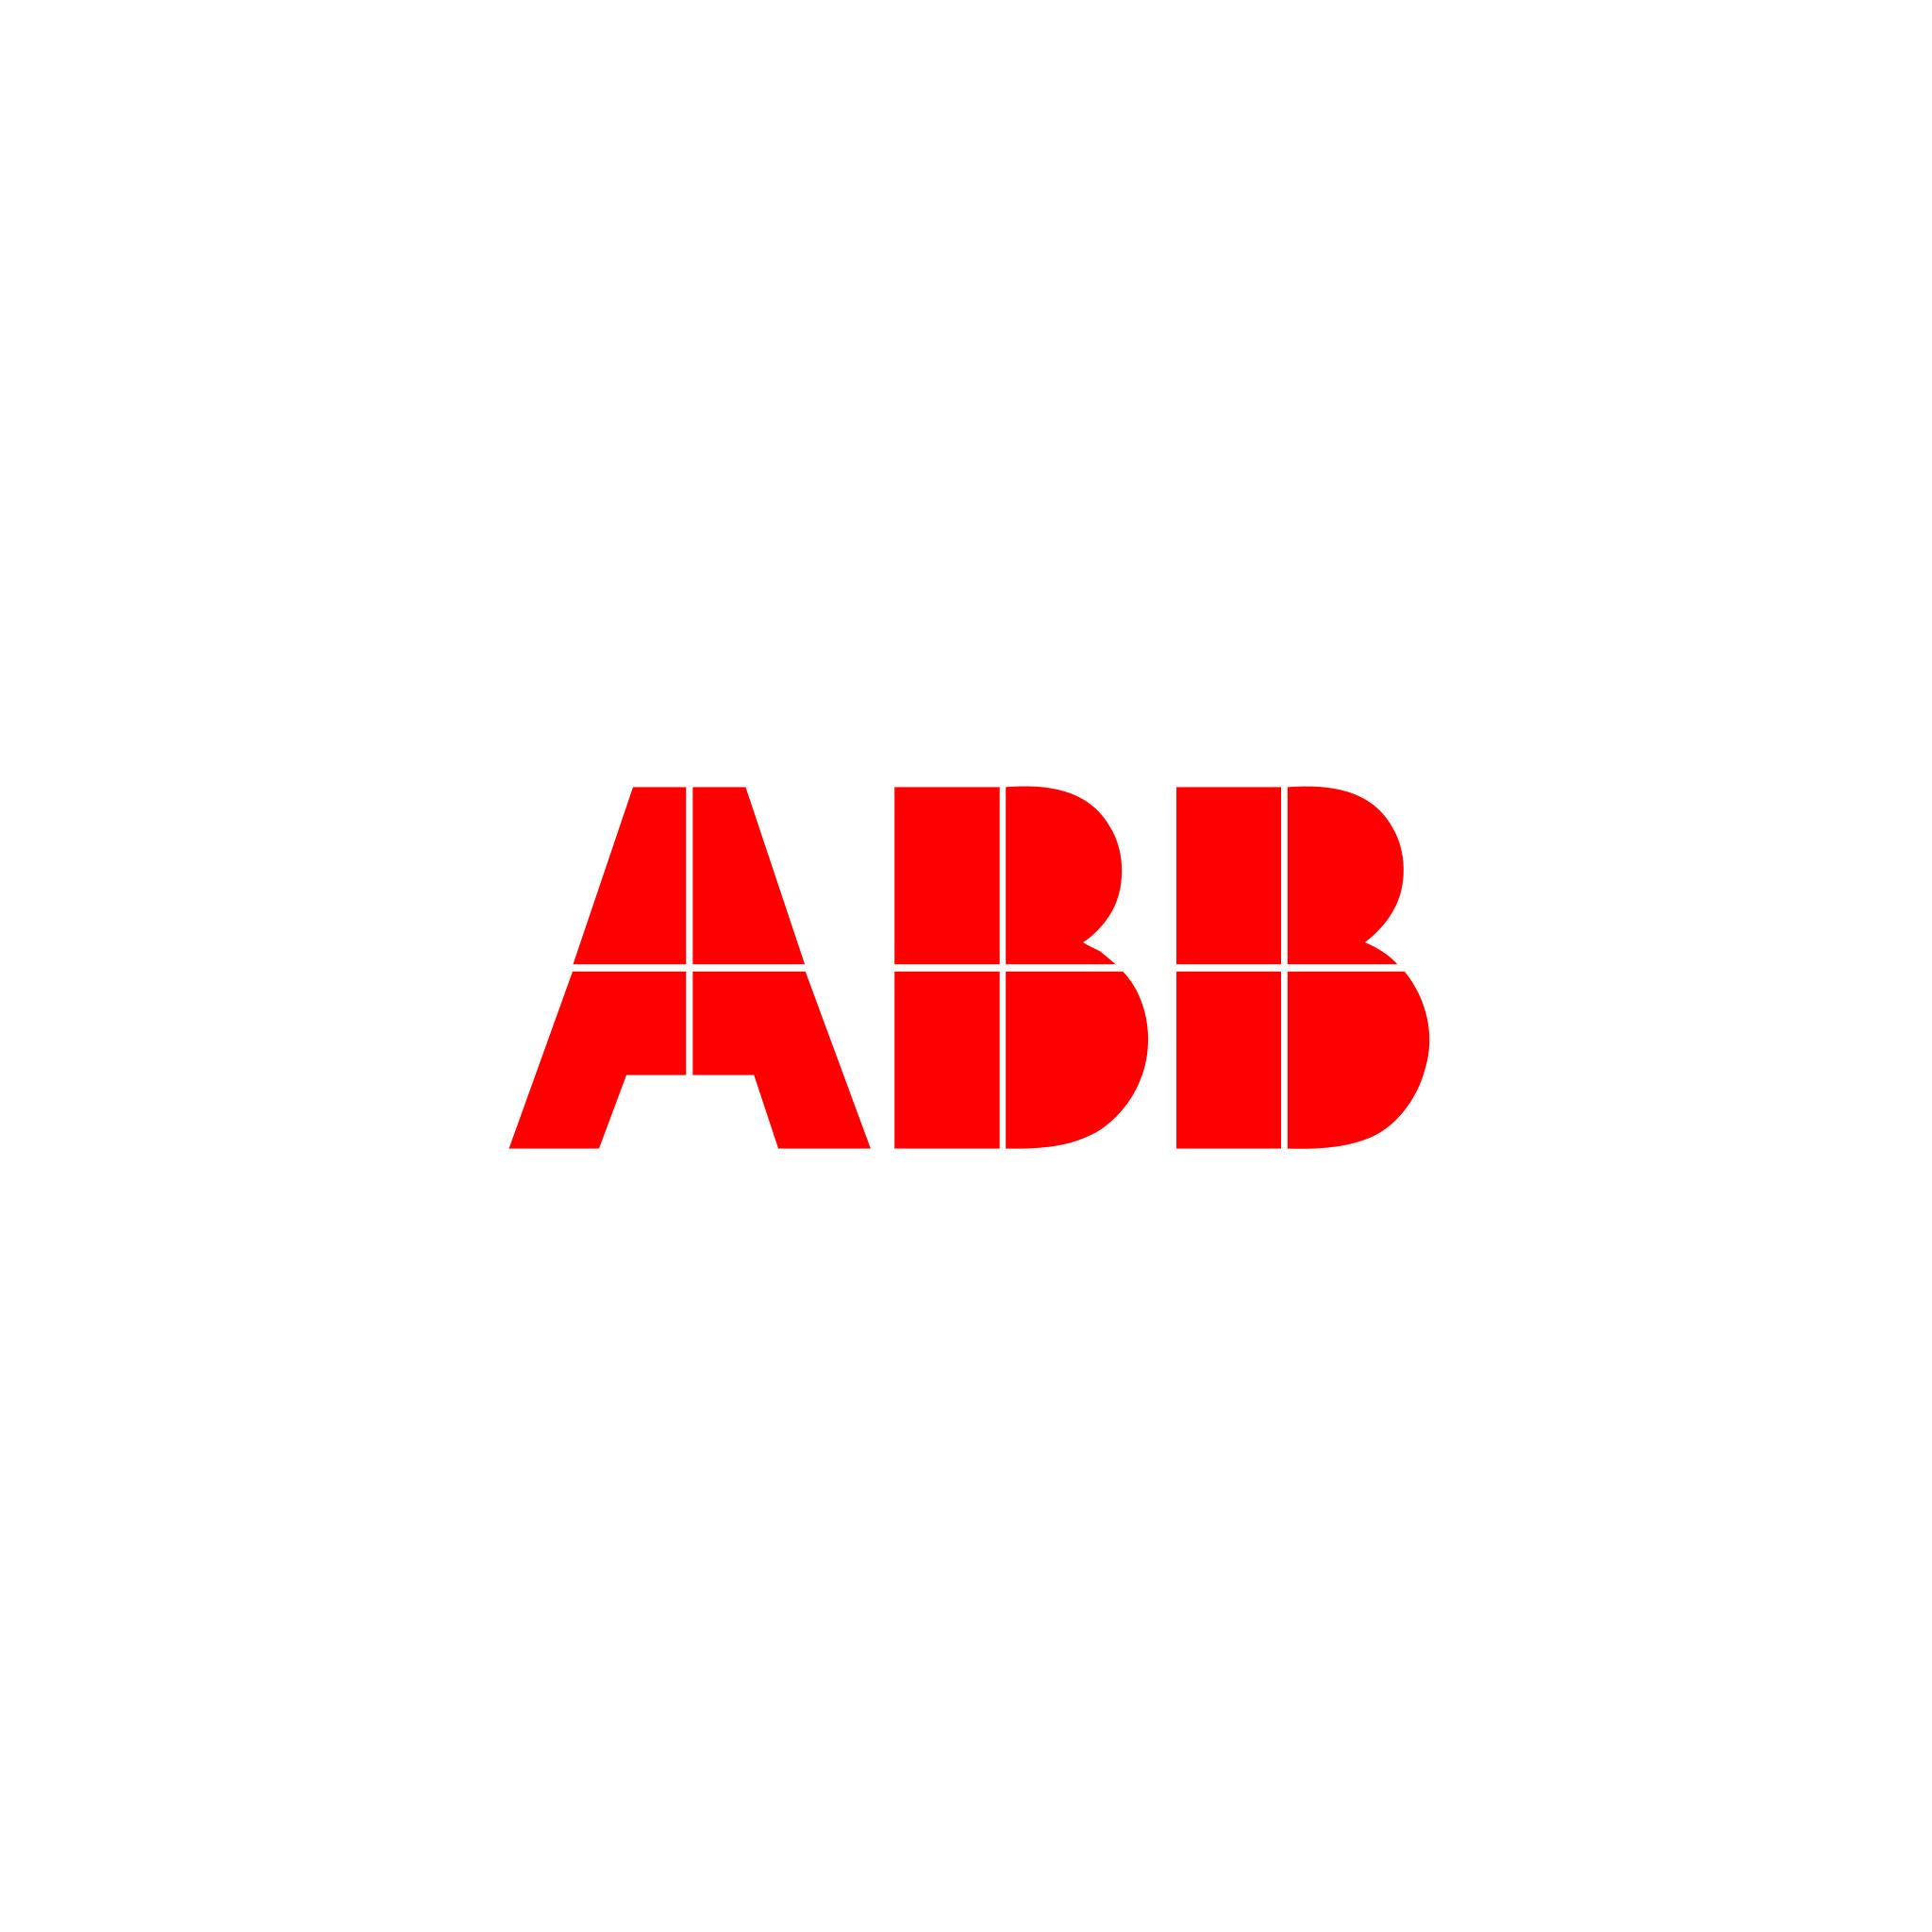 fij_abb